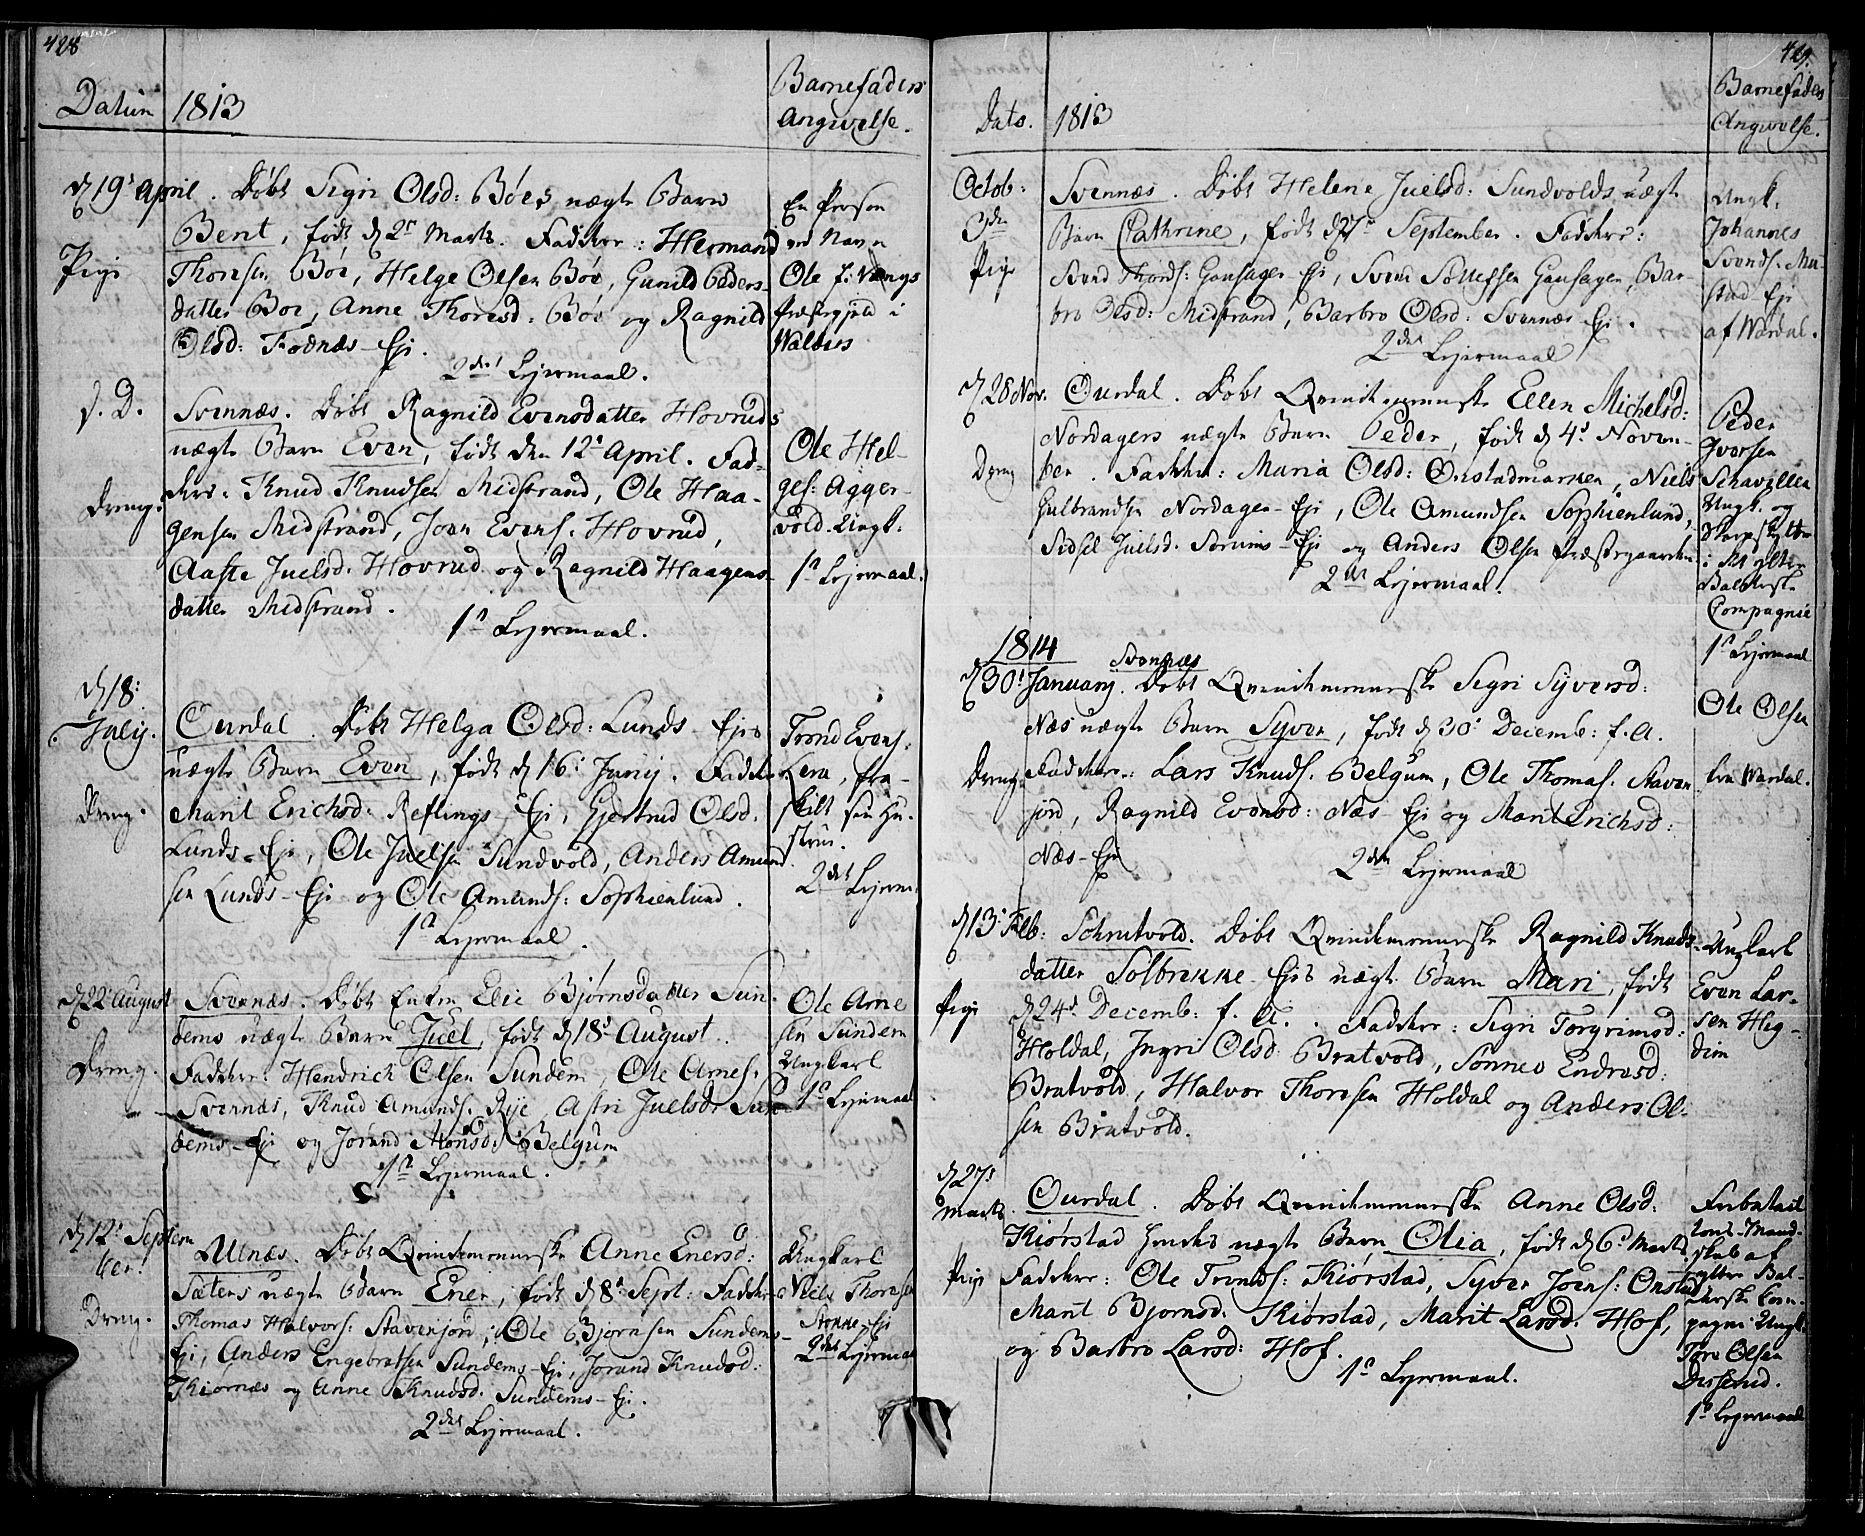 SAH, Nord-Aurdal prestekontor, Ministerialbok nr. 1, 1808-1815, s. 428-429